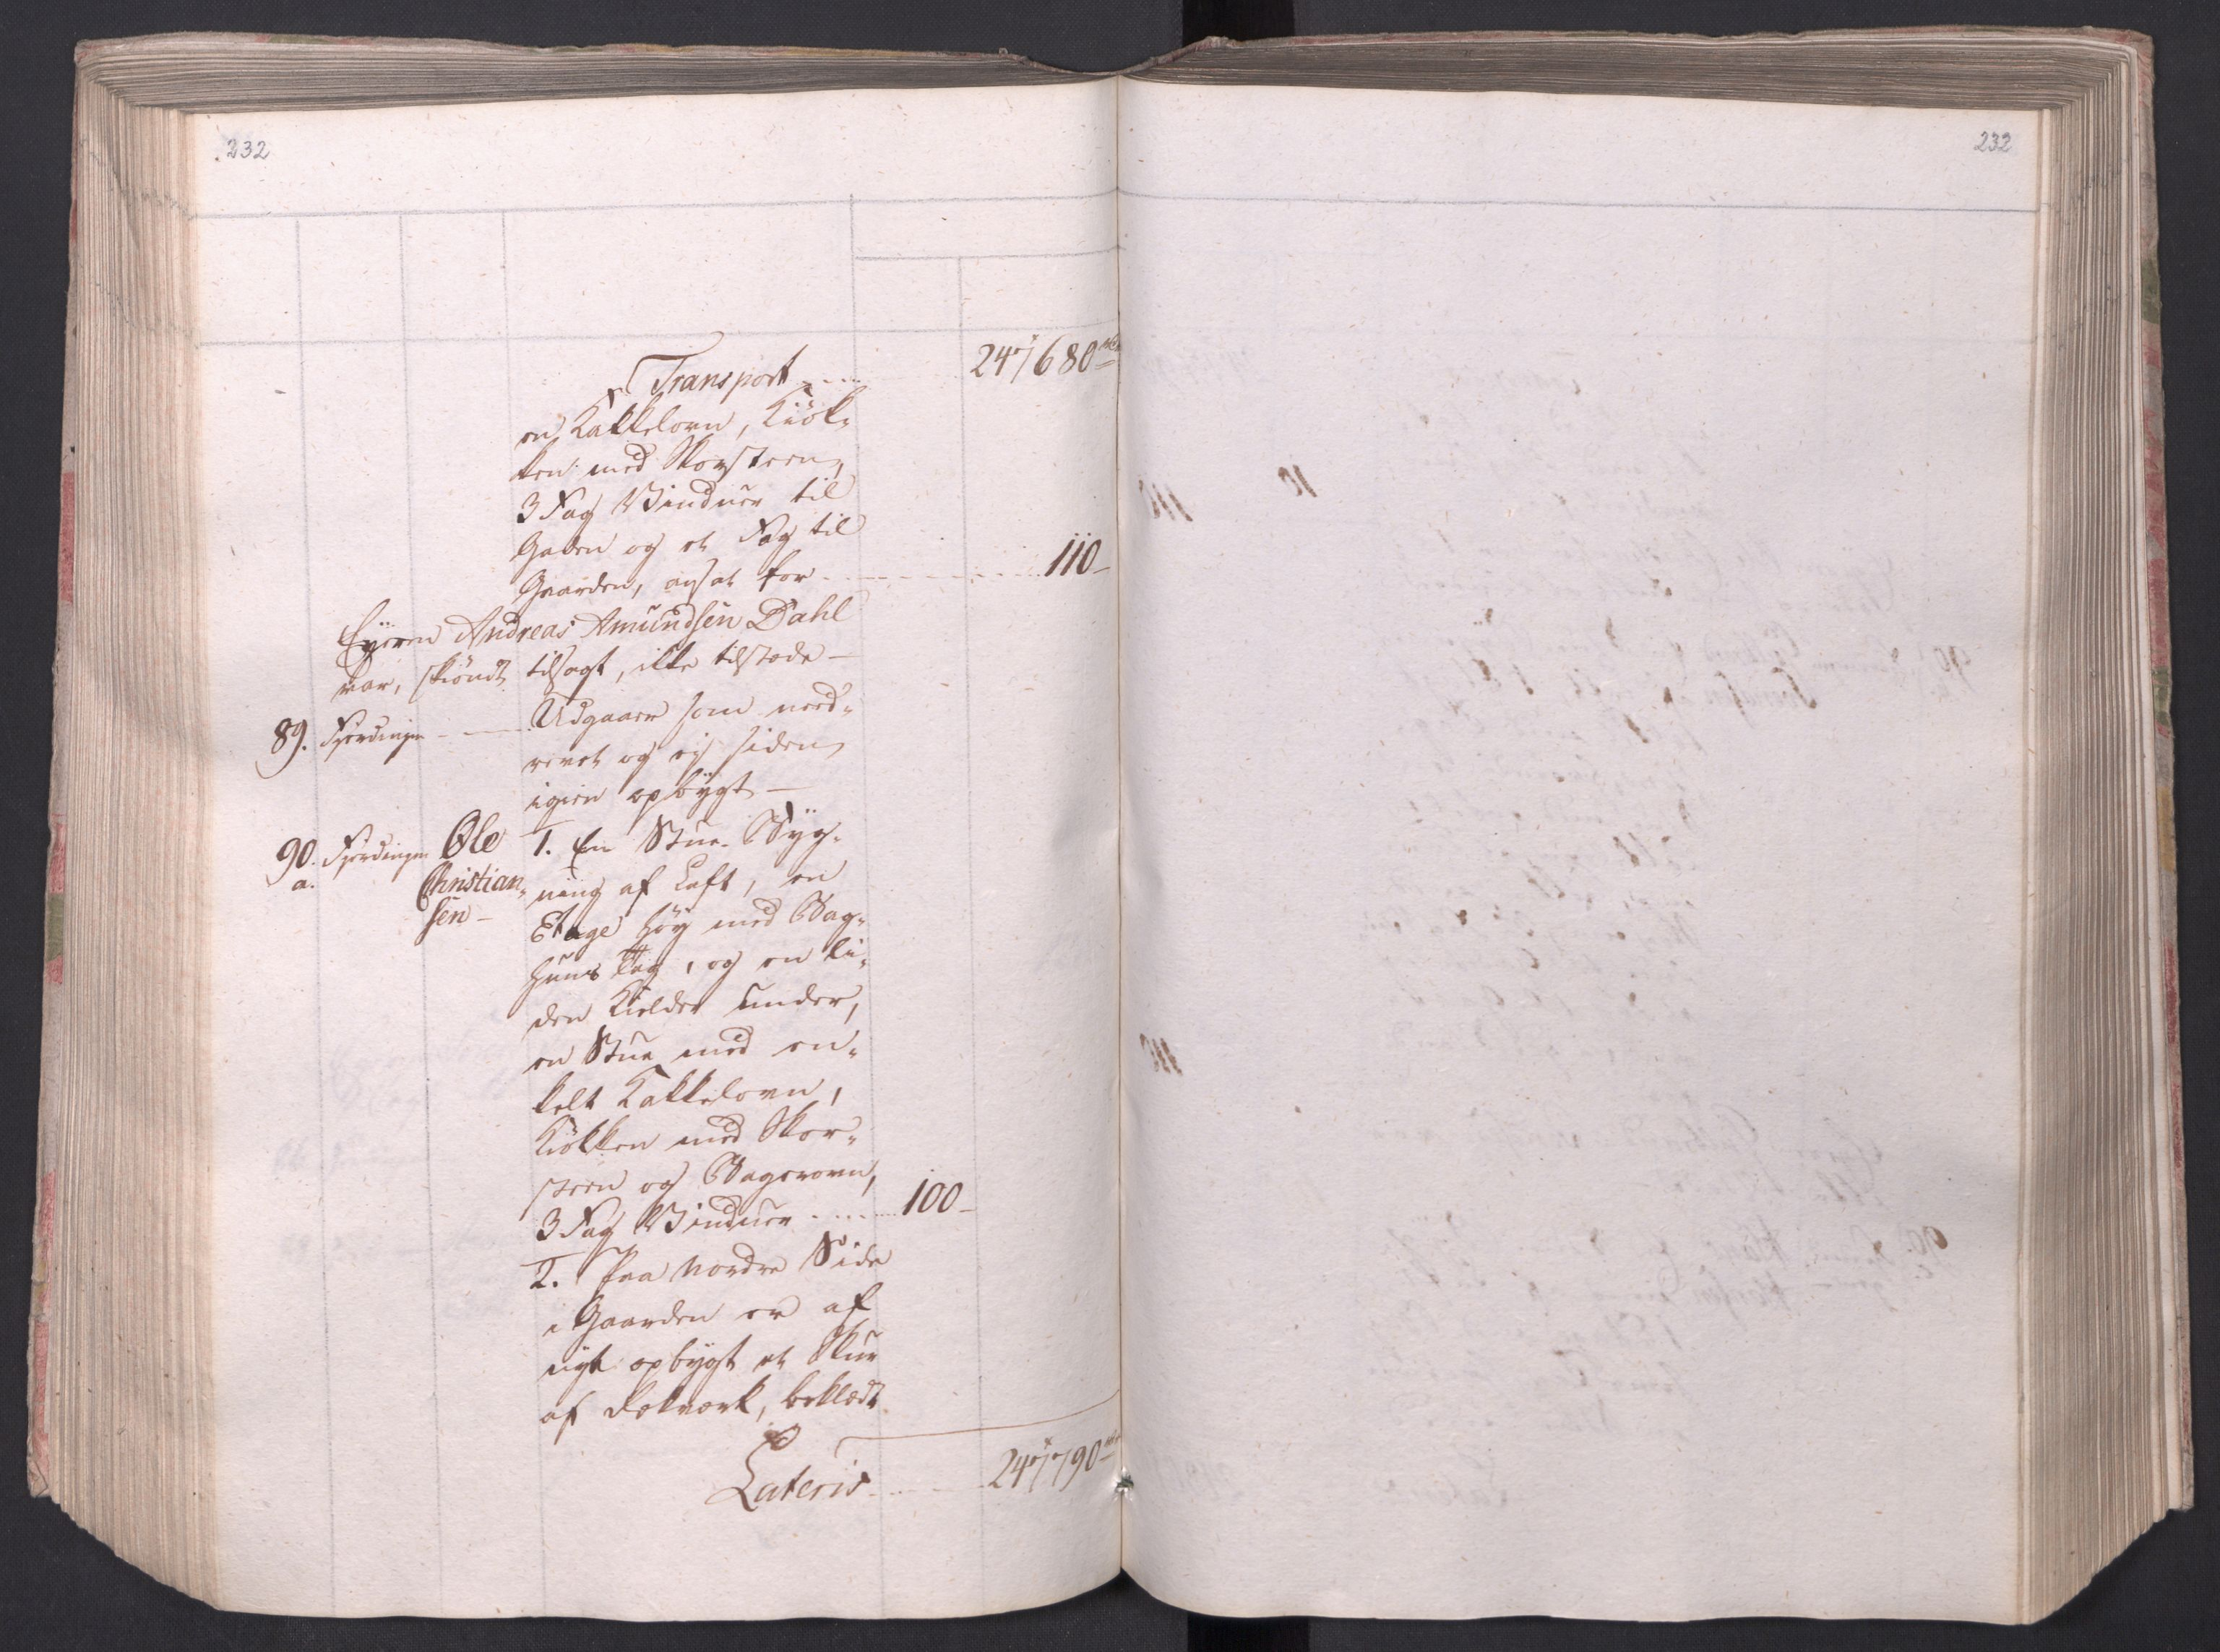 SAO, Kristiania stiftamt, I/Ia/L0015: Branntakster, 1797, s. 232